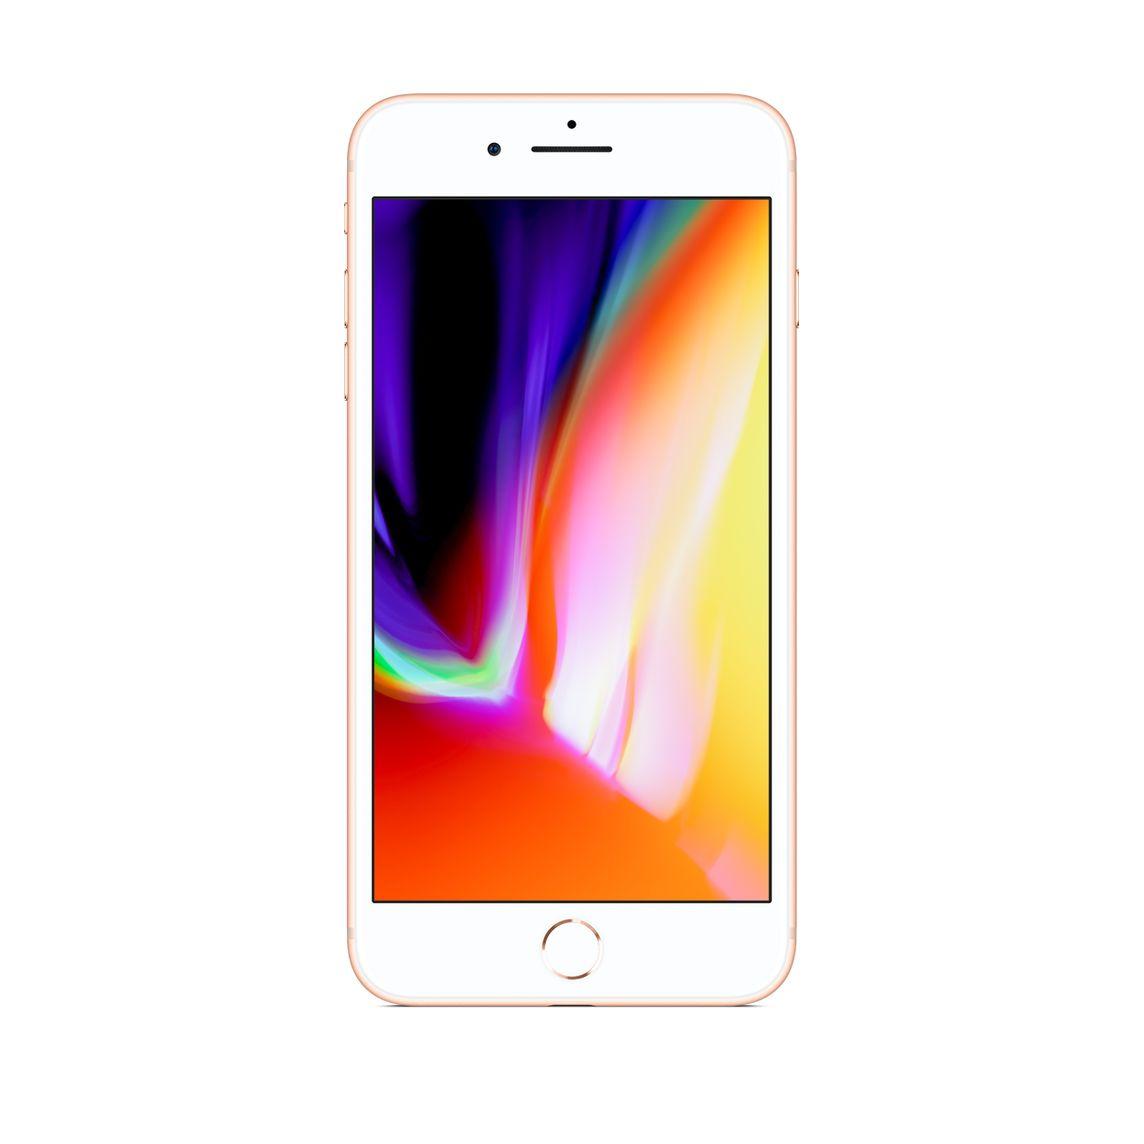 Refurbished Iphone 8 Plus 256gb Gold Unlocked Apple